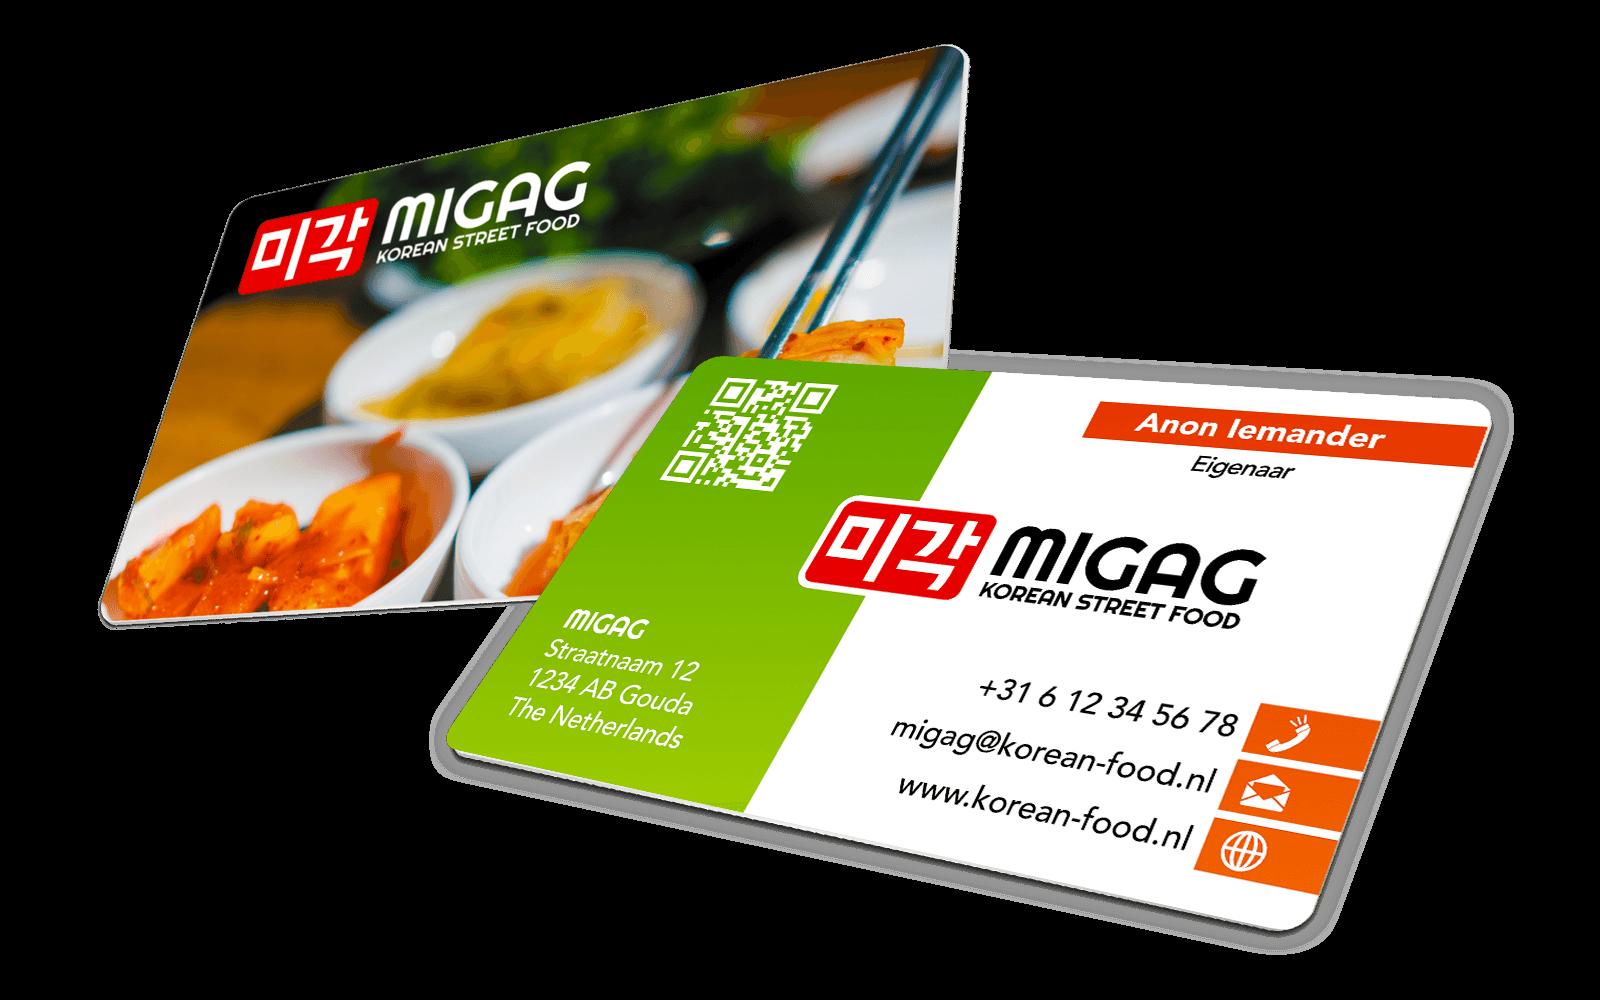 Migag-visitekaart-img